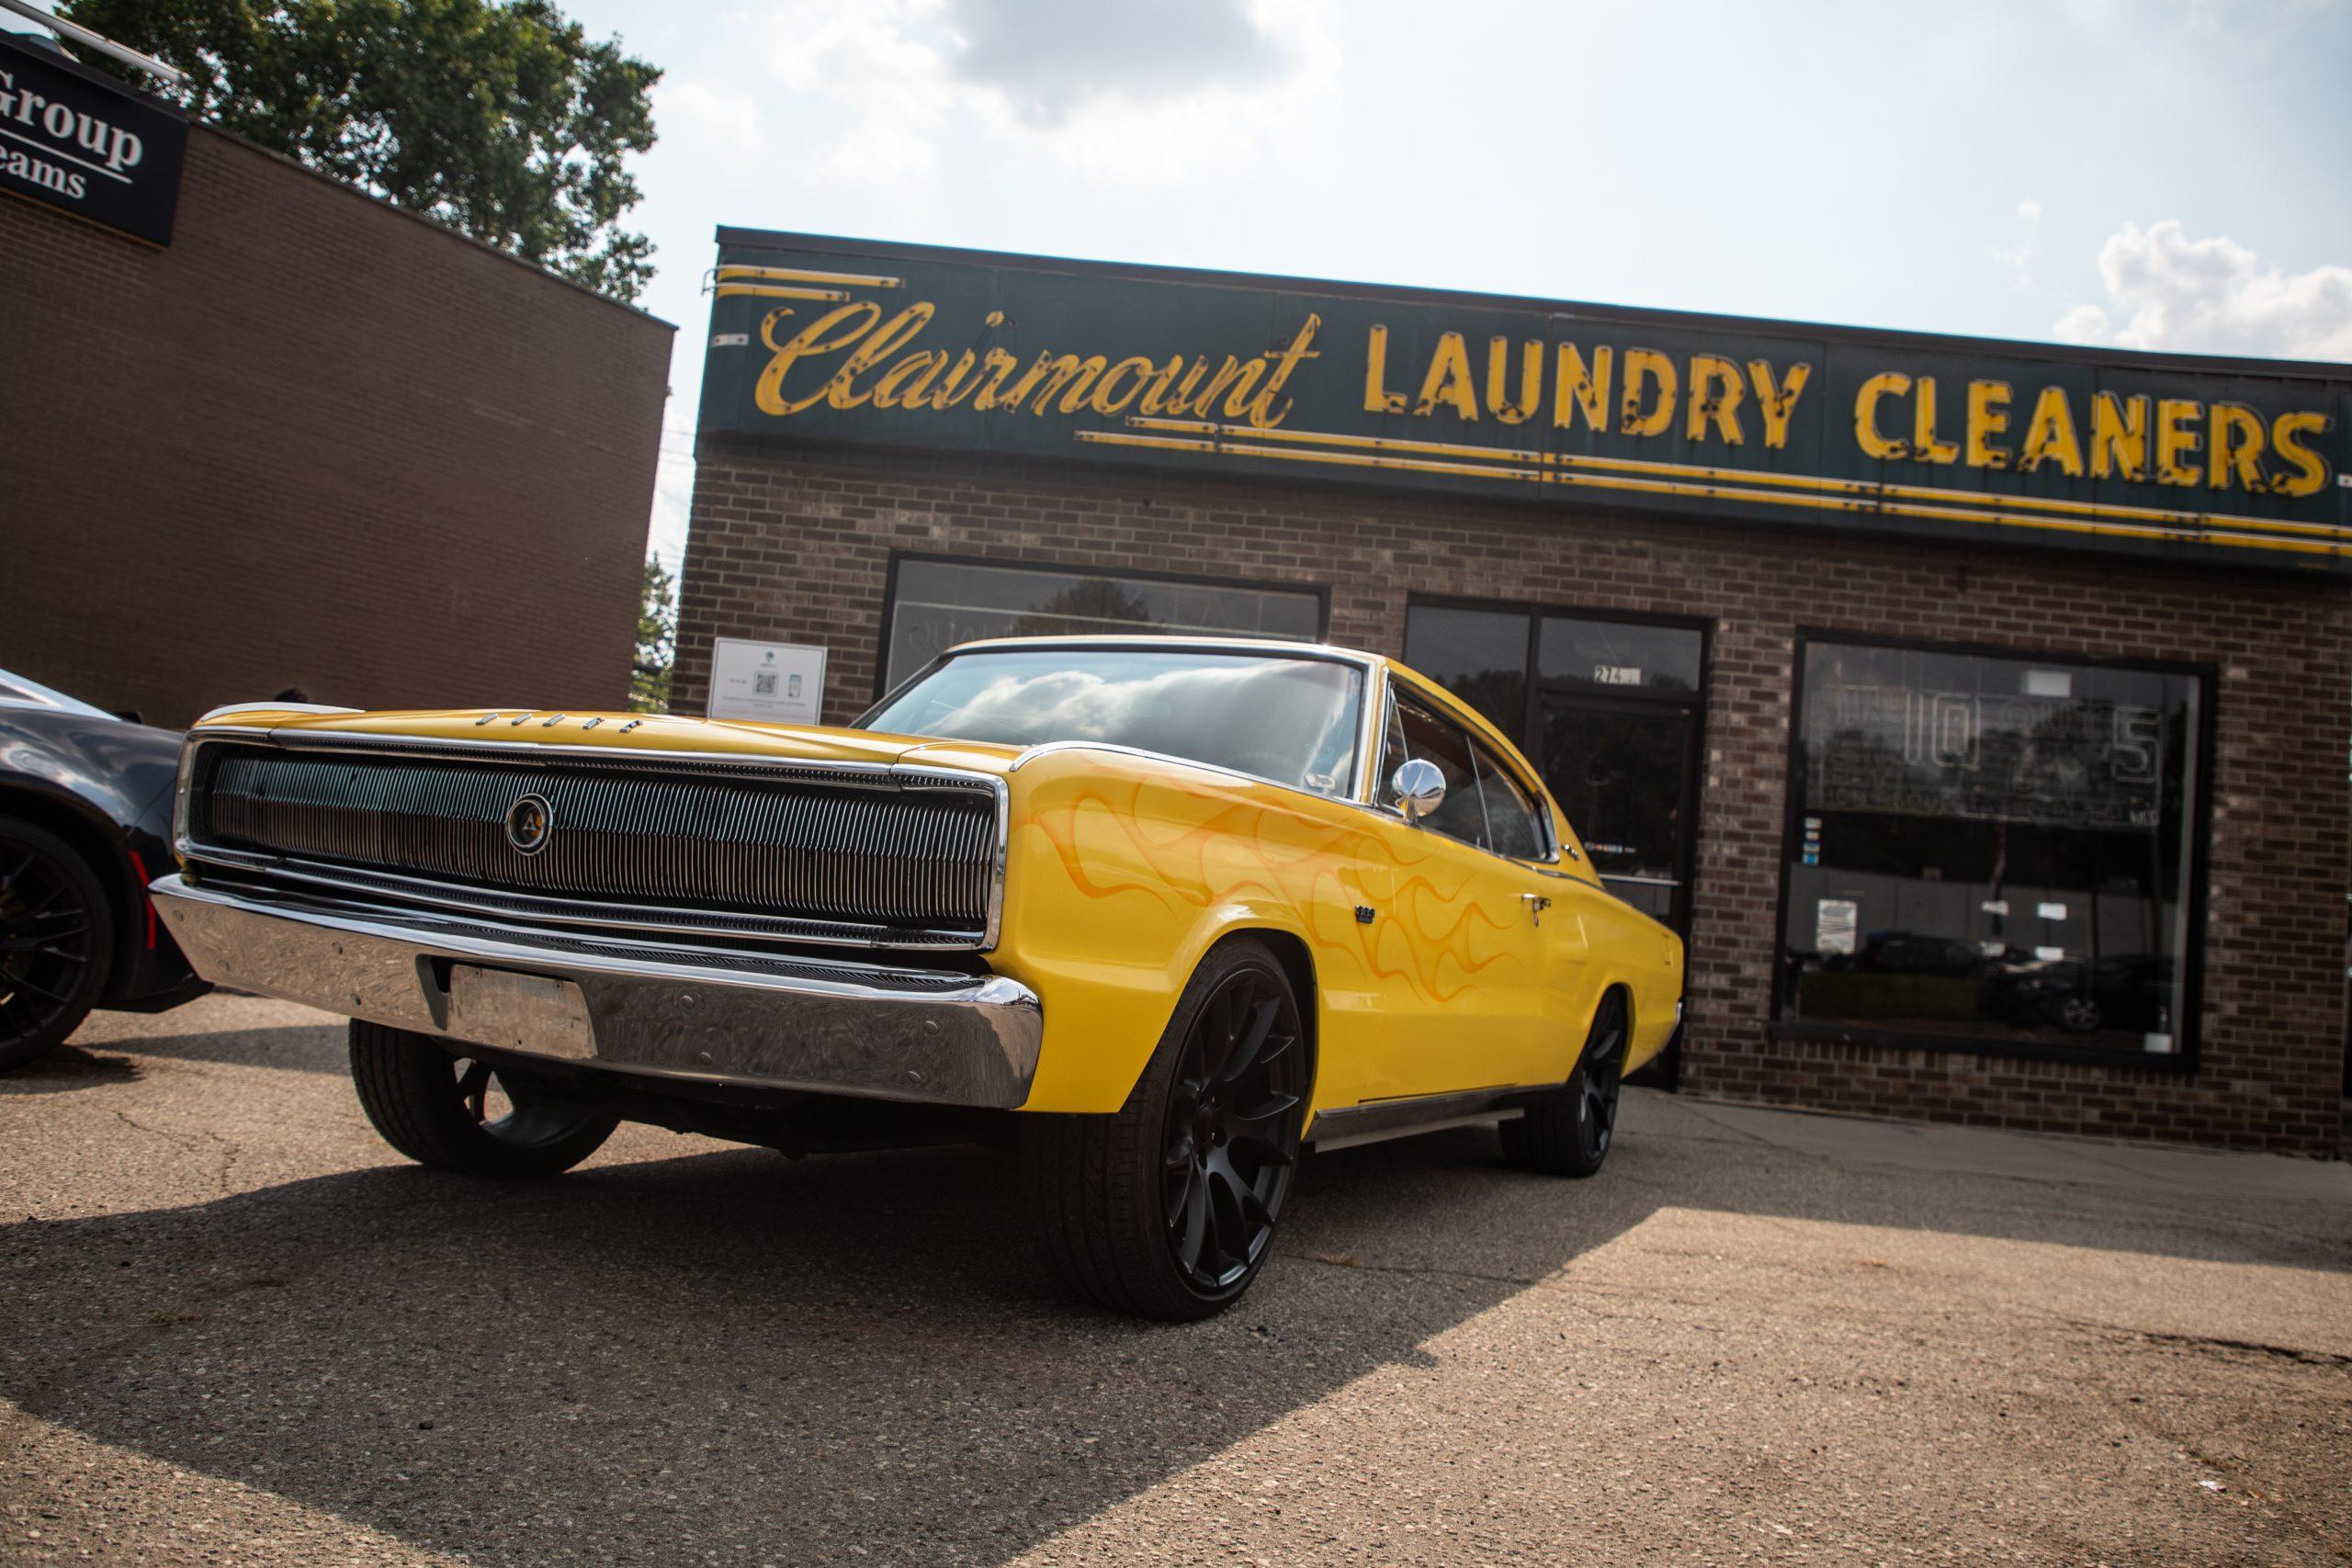 2021 Dream Cruise woodward ave action dodge clairmount laundry